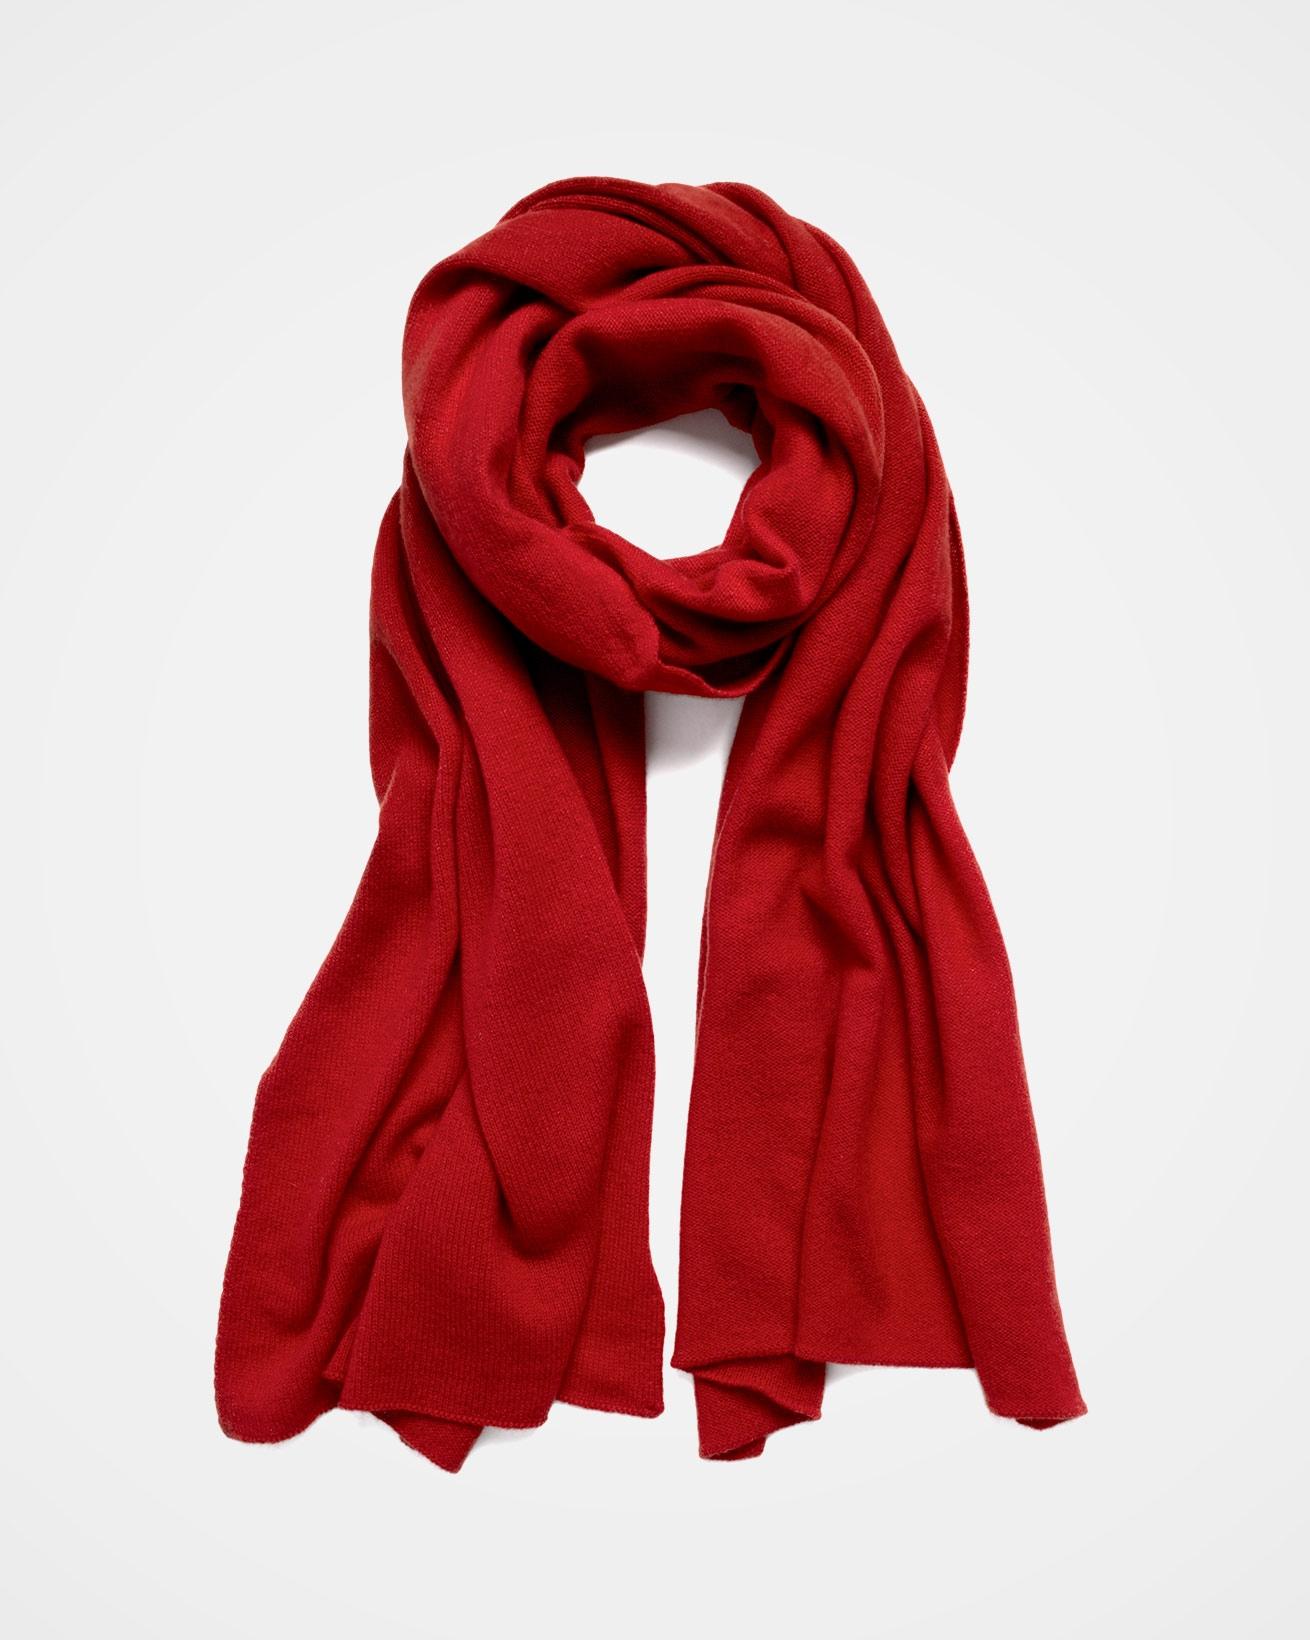 7488_cashmere-stole_red_swirl_web.jpg